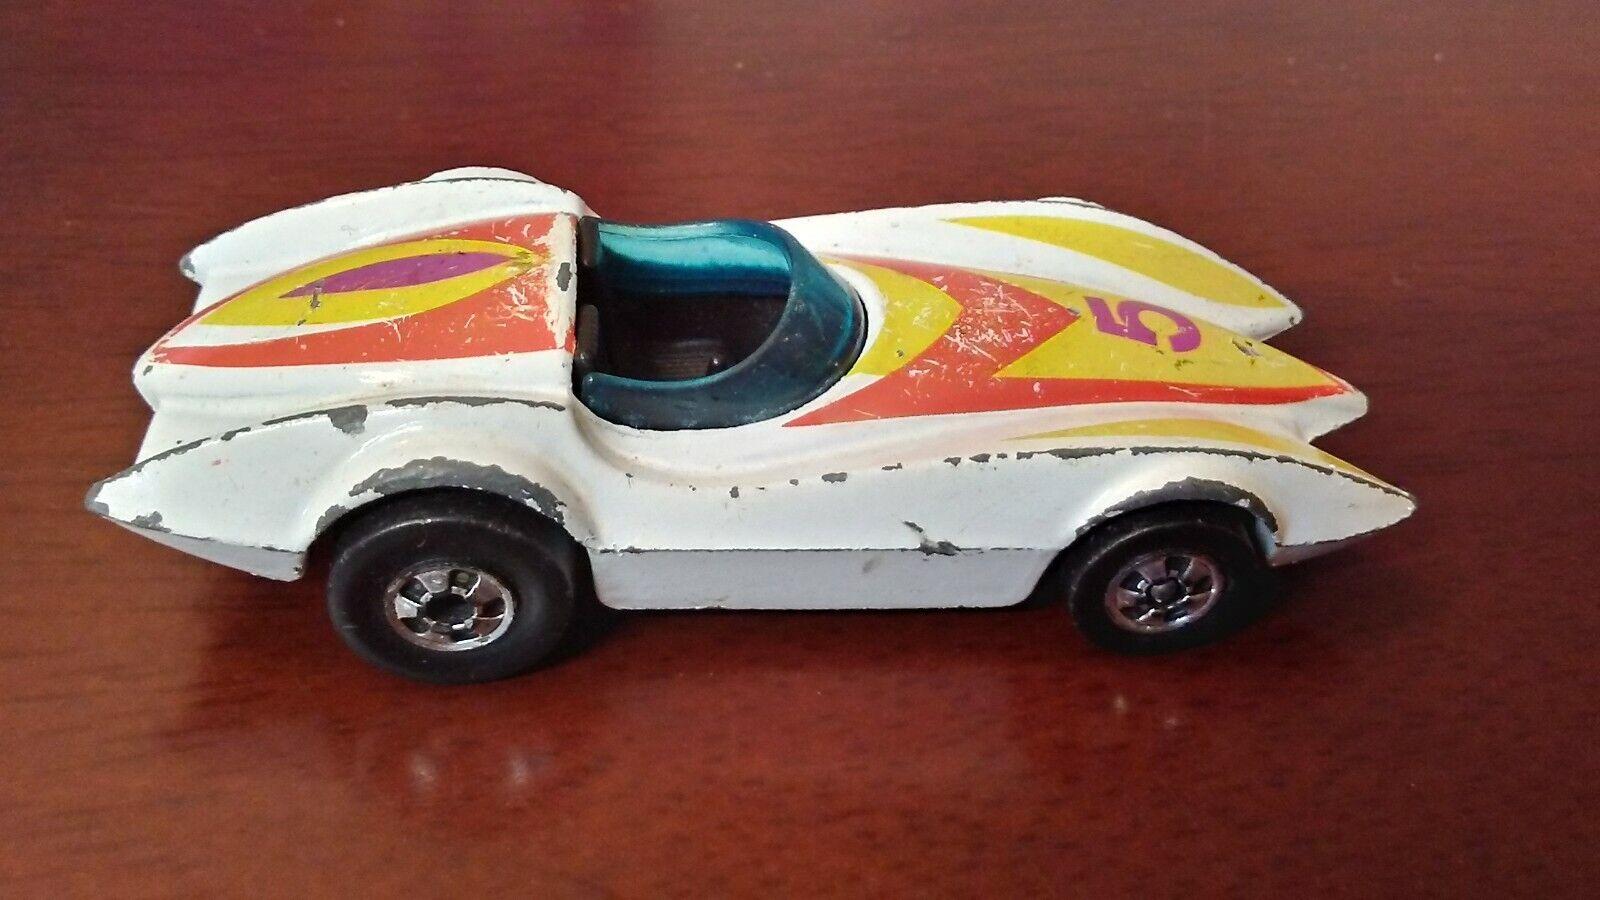 prezzi più bassi Caliente Ruedas Ruedas Ruedas Second Wind Racer 1976  spedizione e scambi gratuiti.